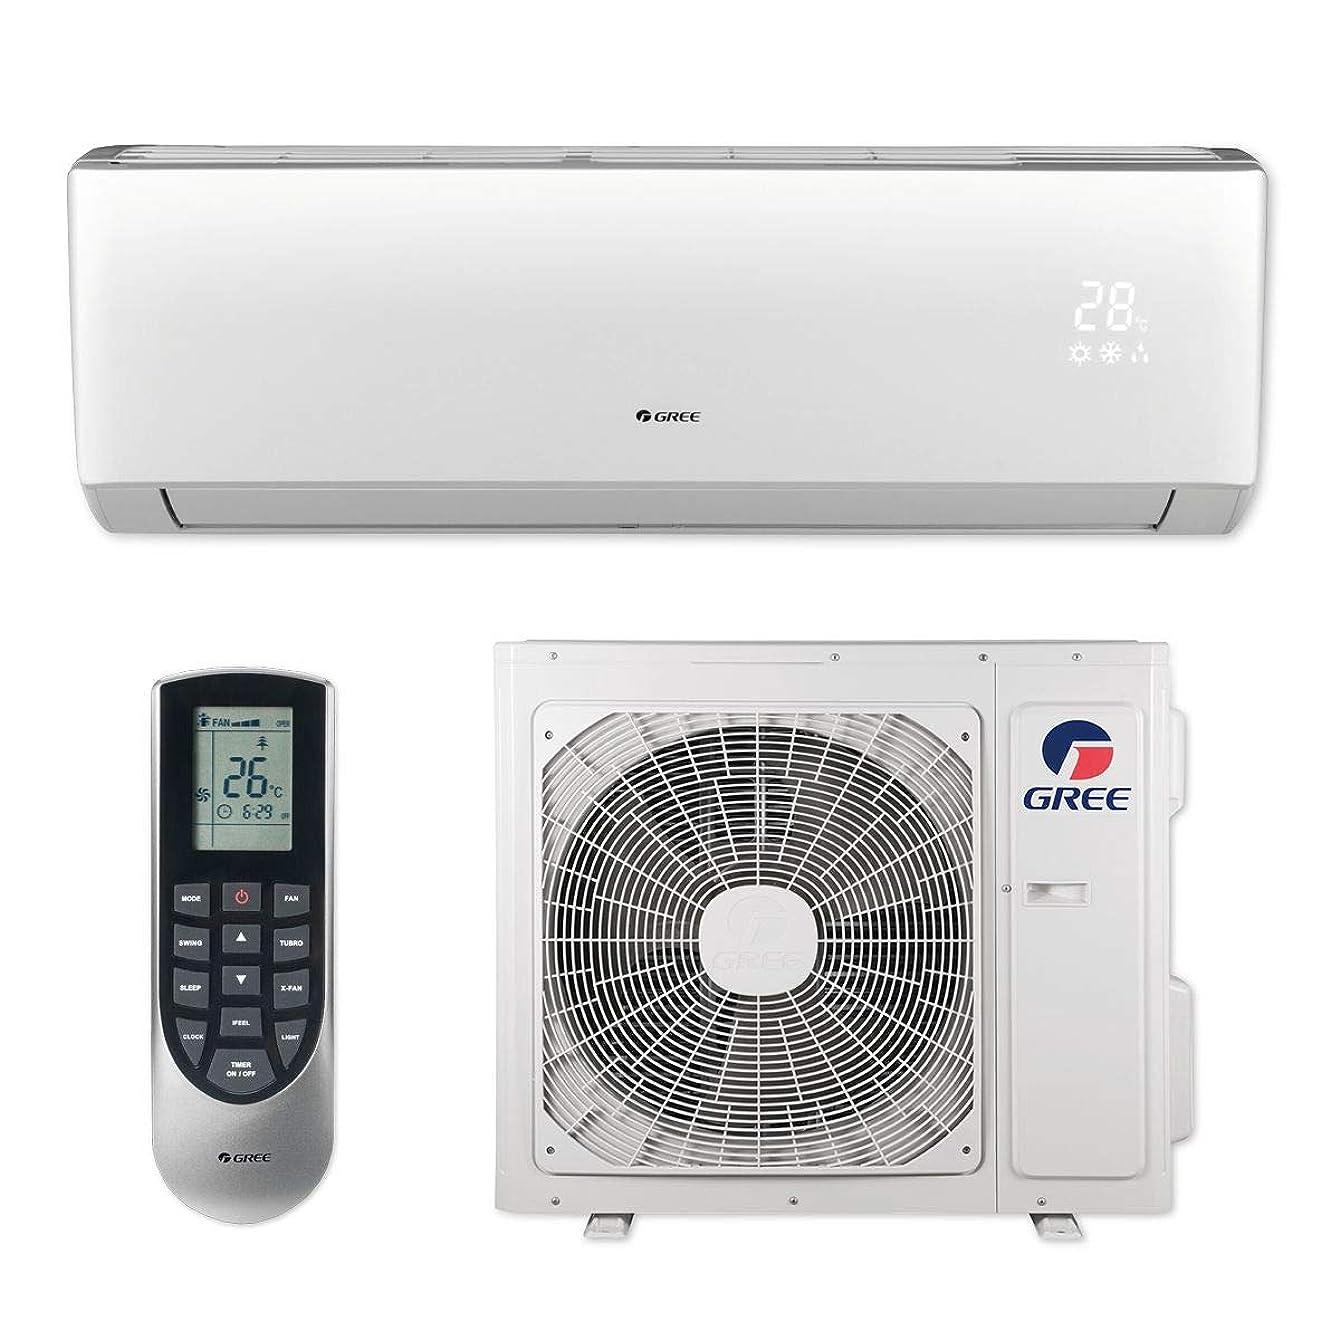 Gree VIR18HP230V1B - 18,000 BTU 20 SEER Vireo+ Wall Mount Ductless Mini Split Air Conditioner Heat Pump 208-230V